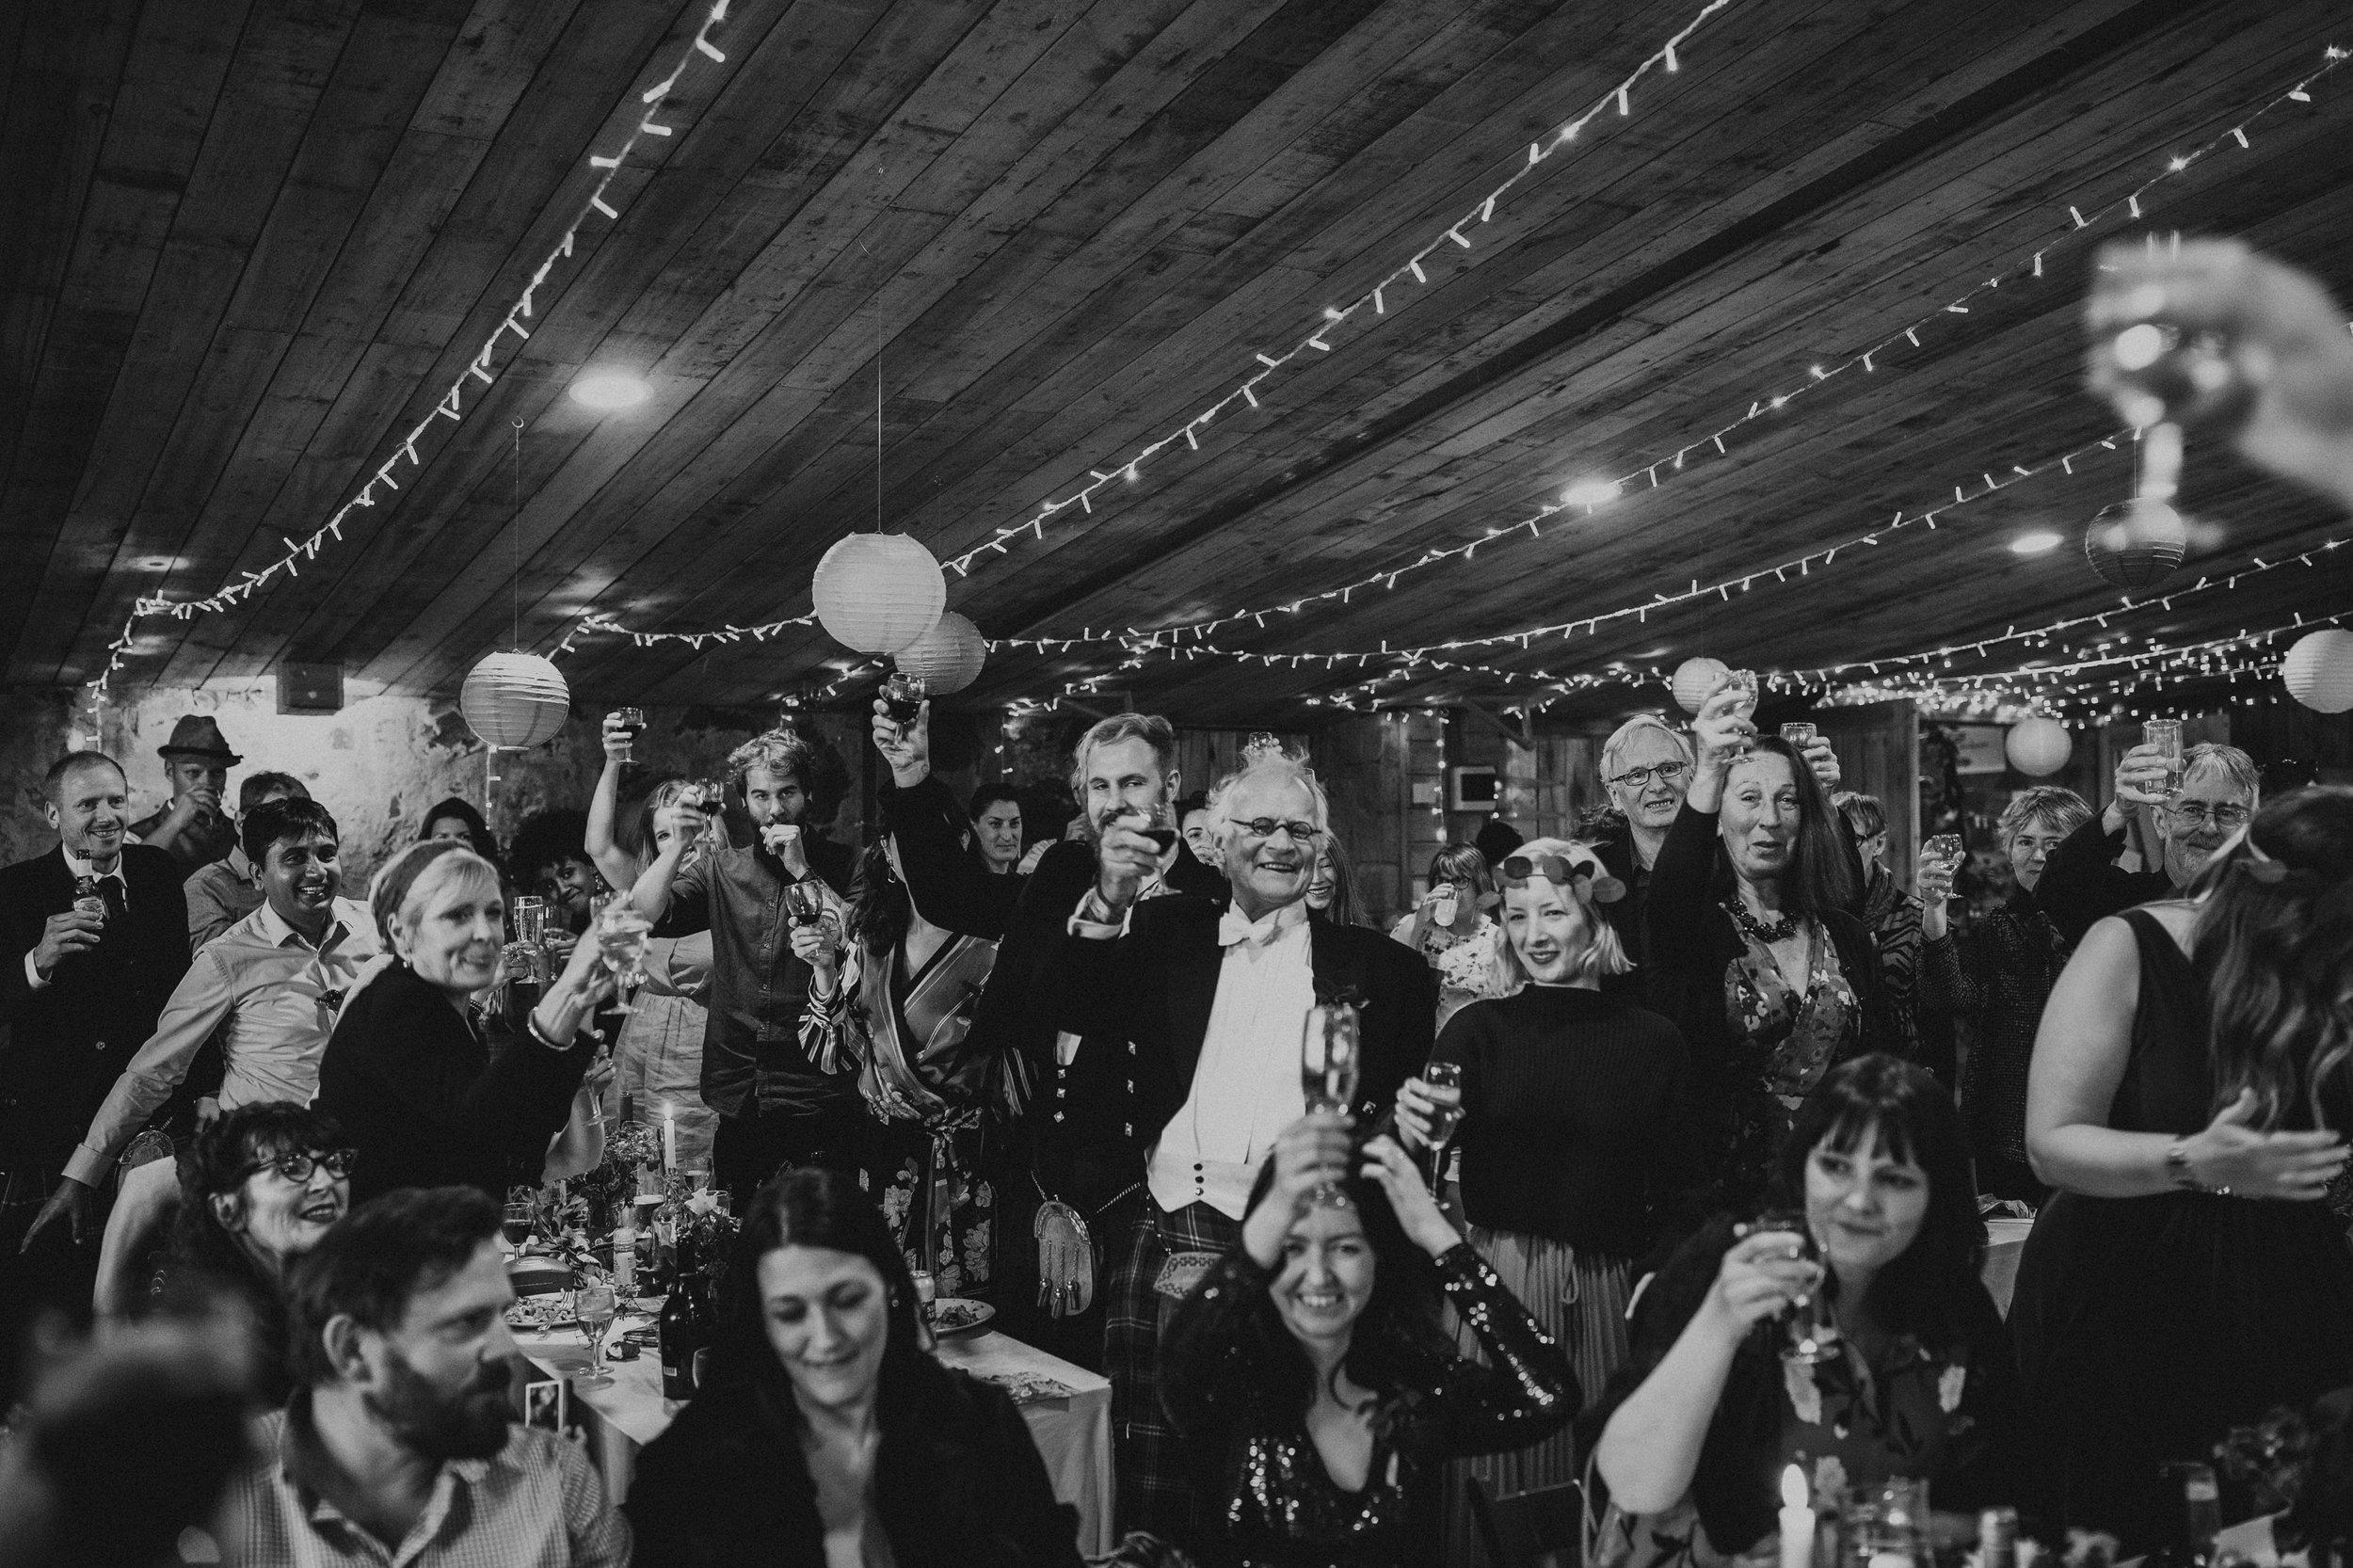 COMRIE_CROFT_WEDDINGS_PJ_PHILLIPS_PHOTOGRAPHY_165.jpg